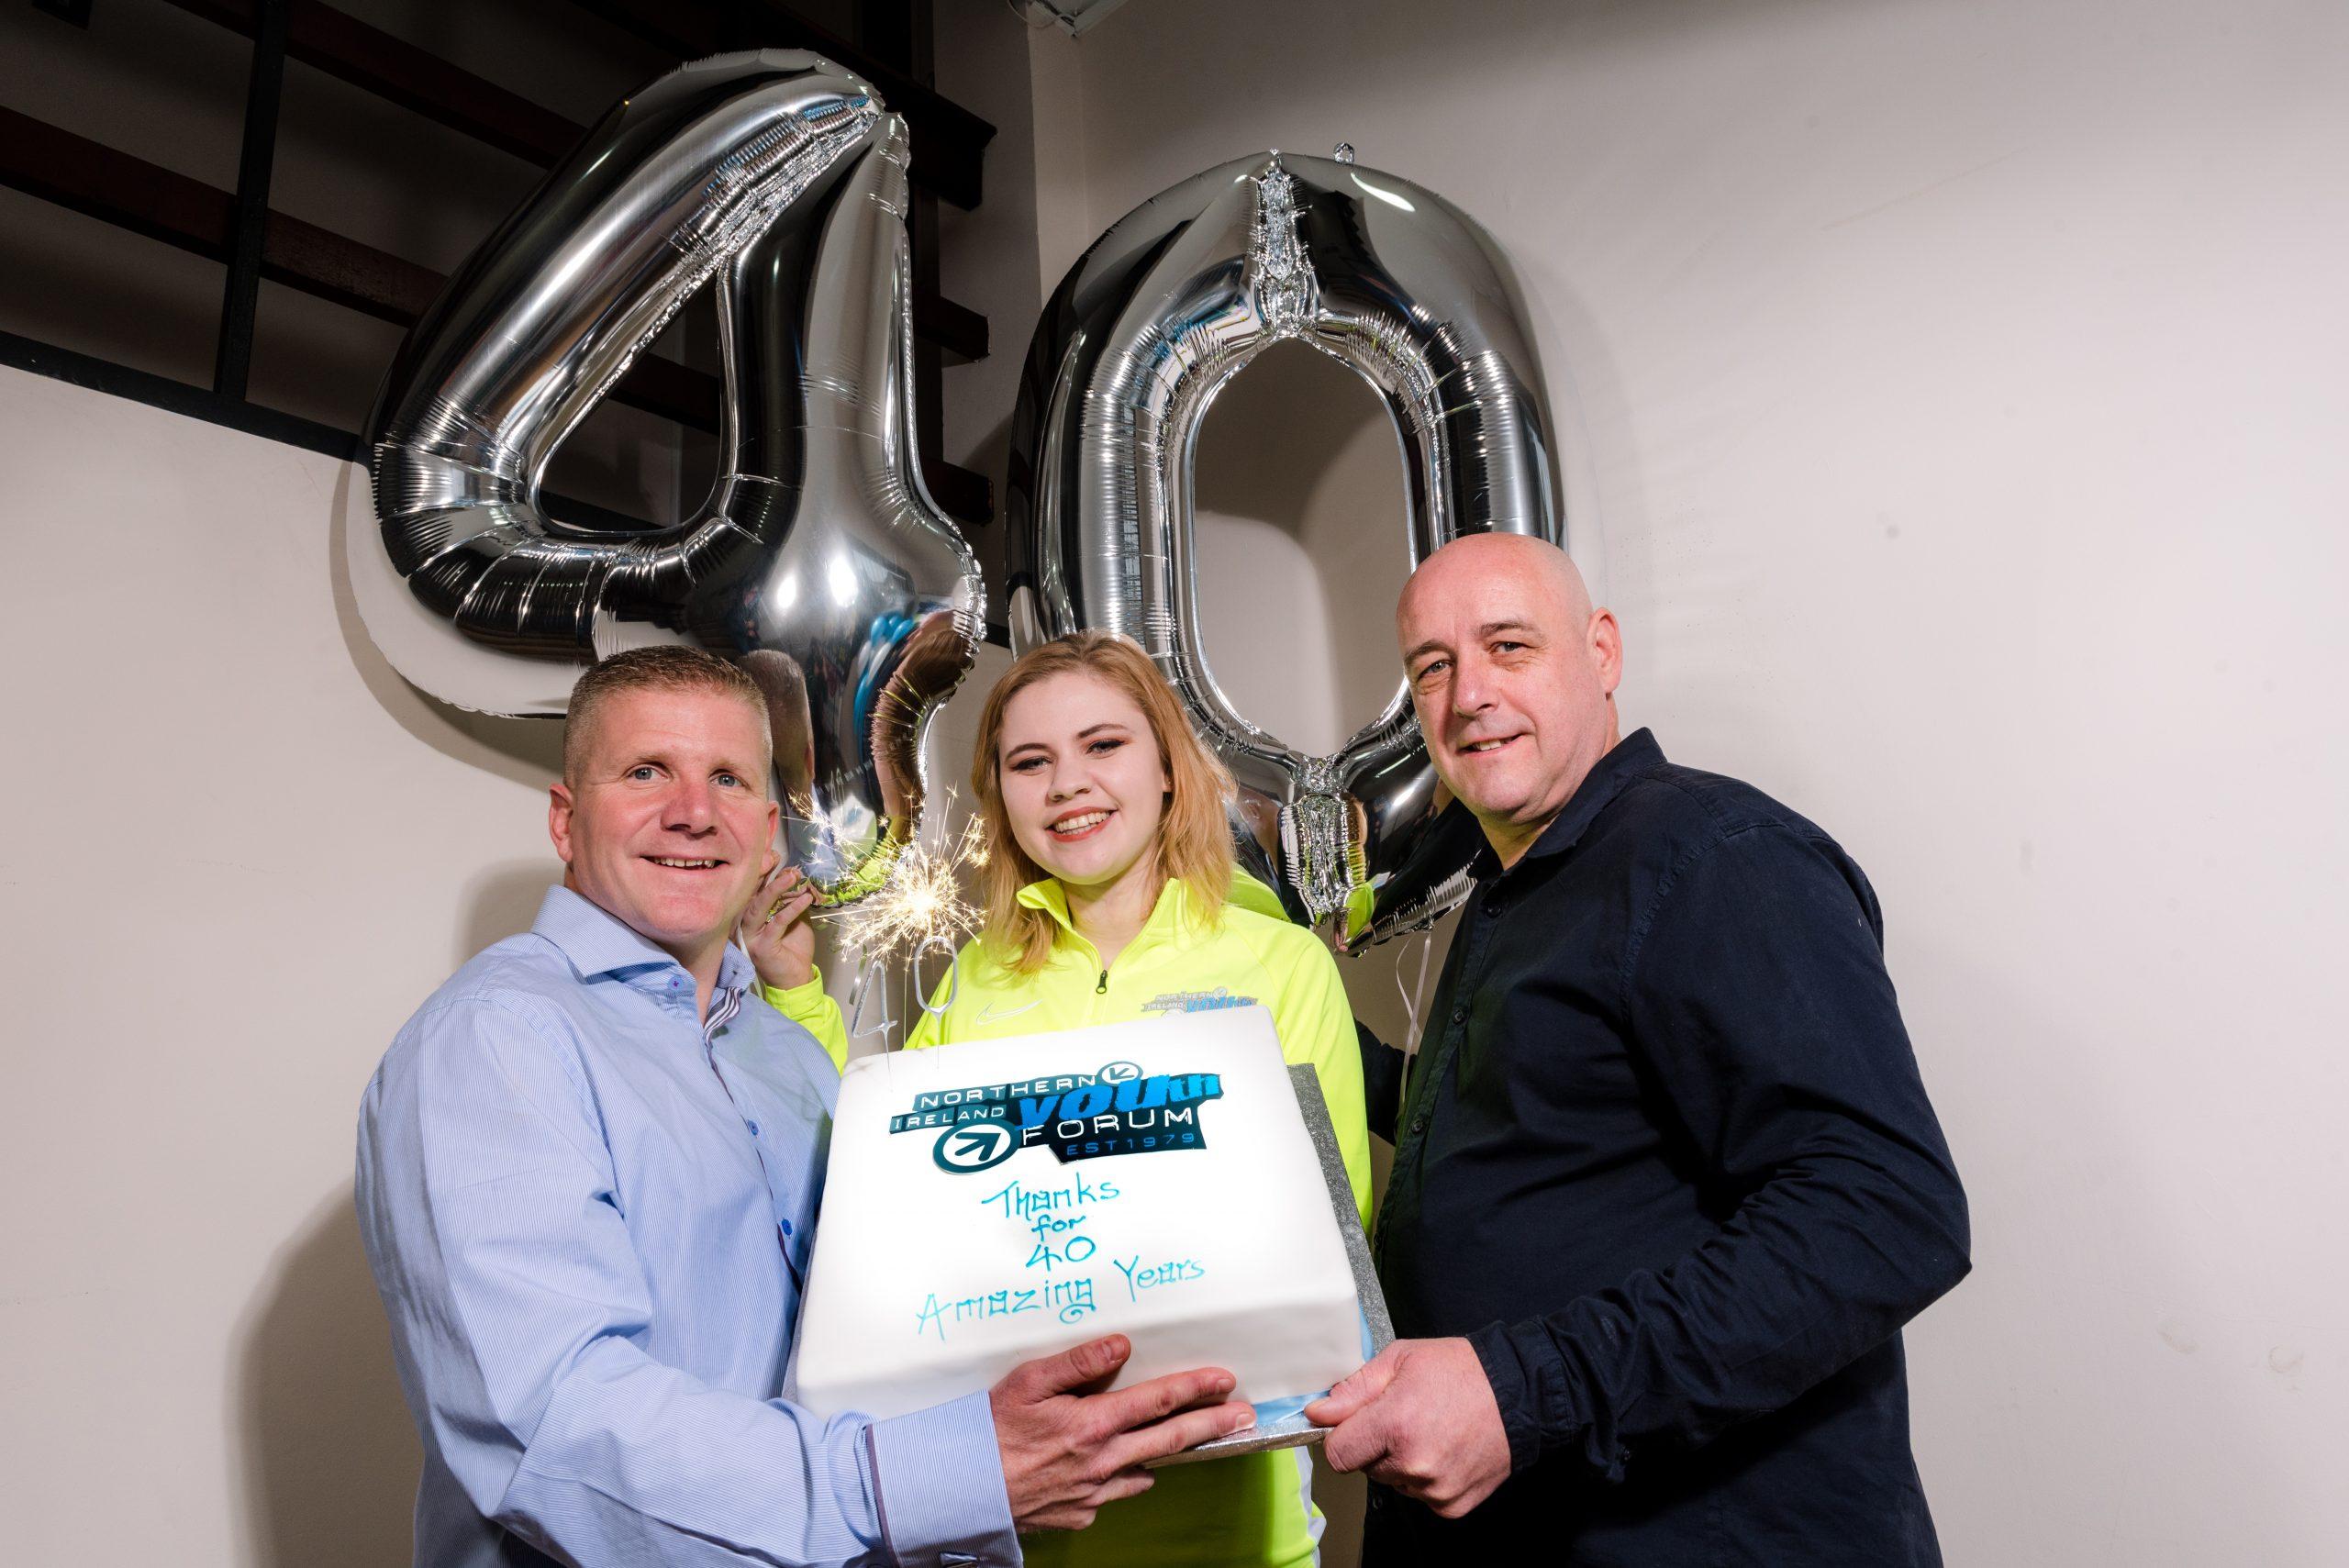 Northern Ireland Youth Forum celebrates rollercoaster 40 years